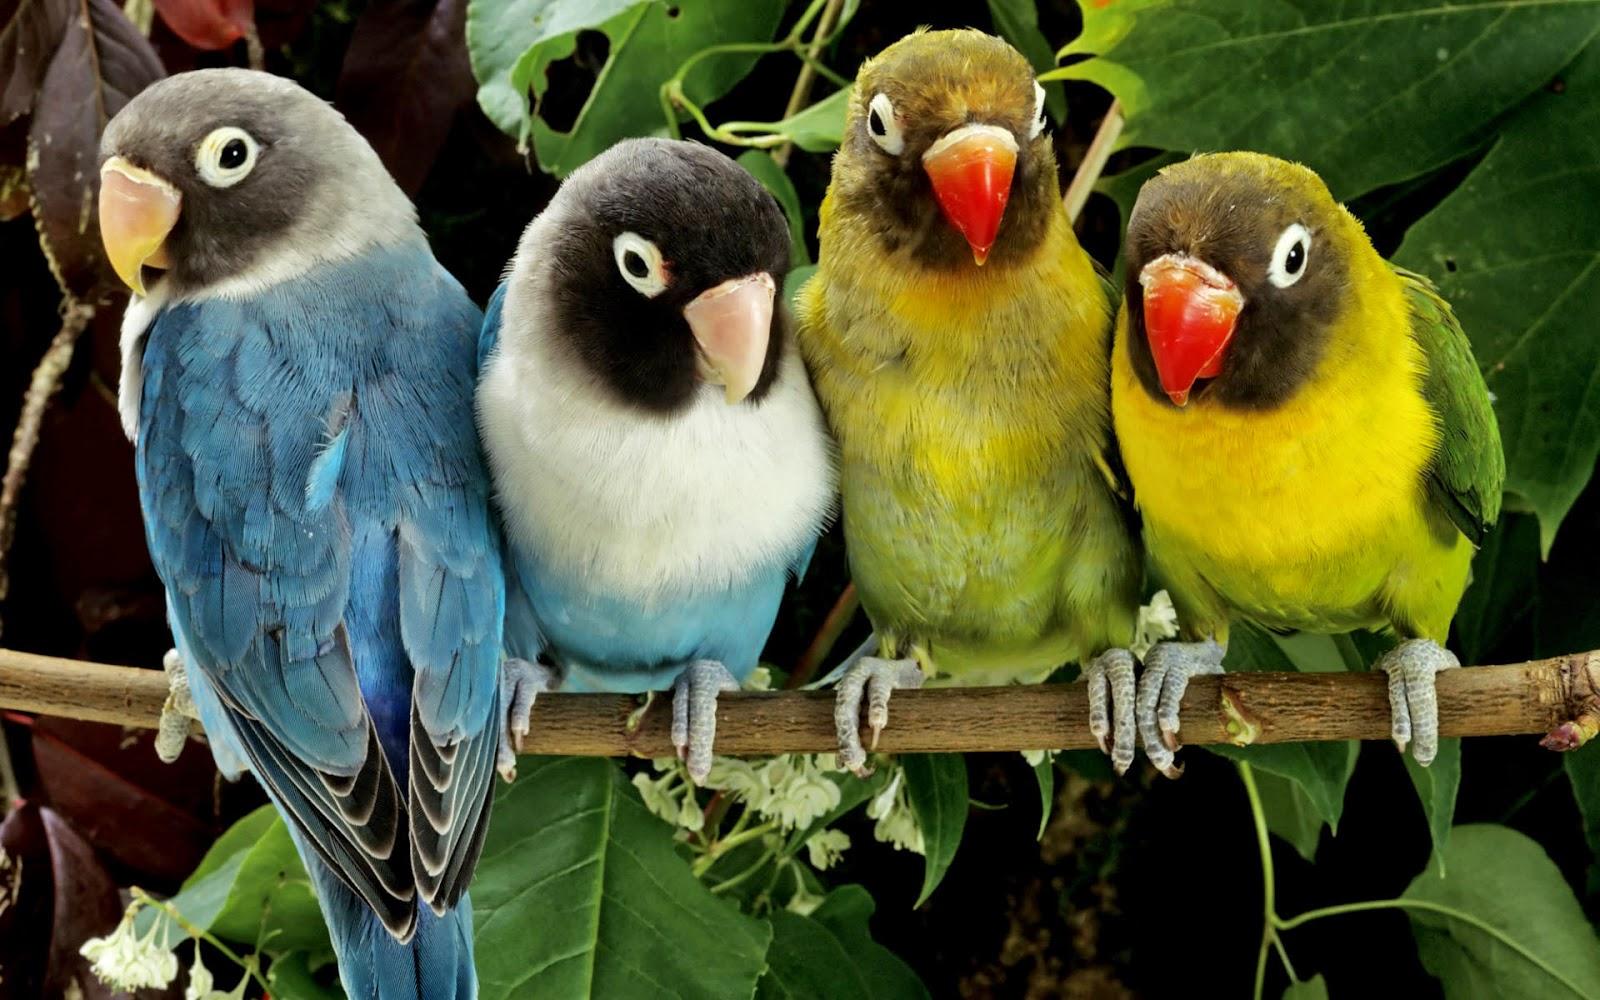 cara ternak burung love bird ternak binatang